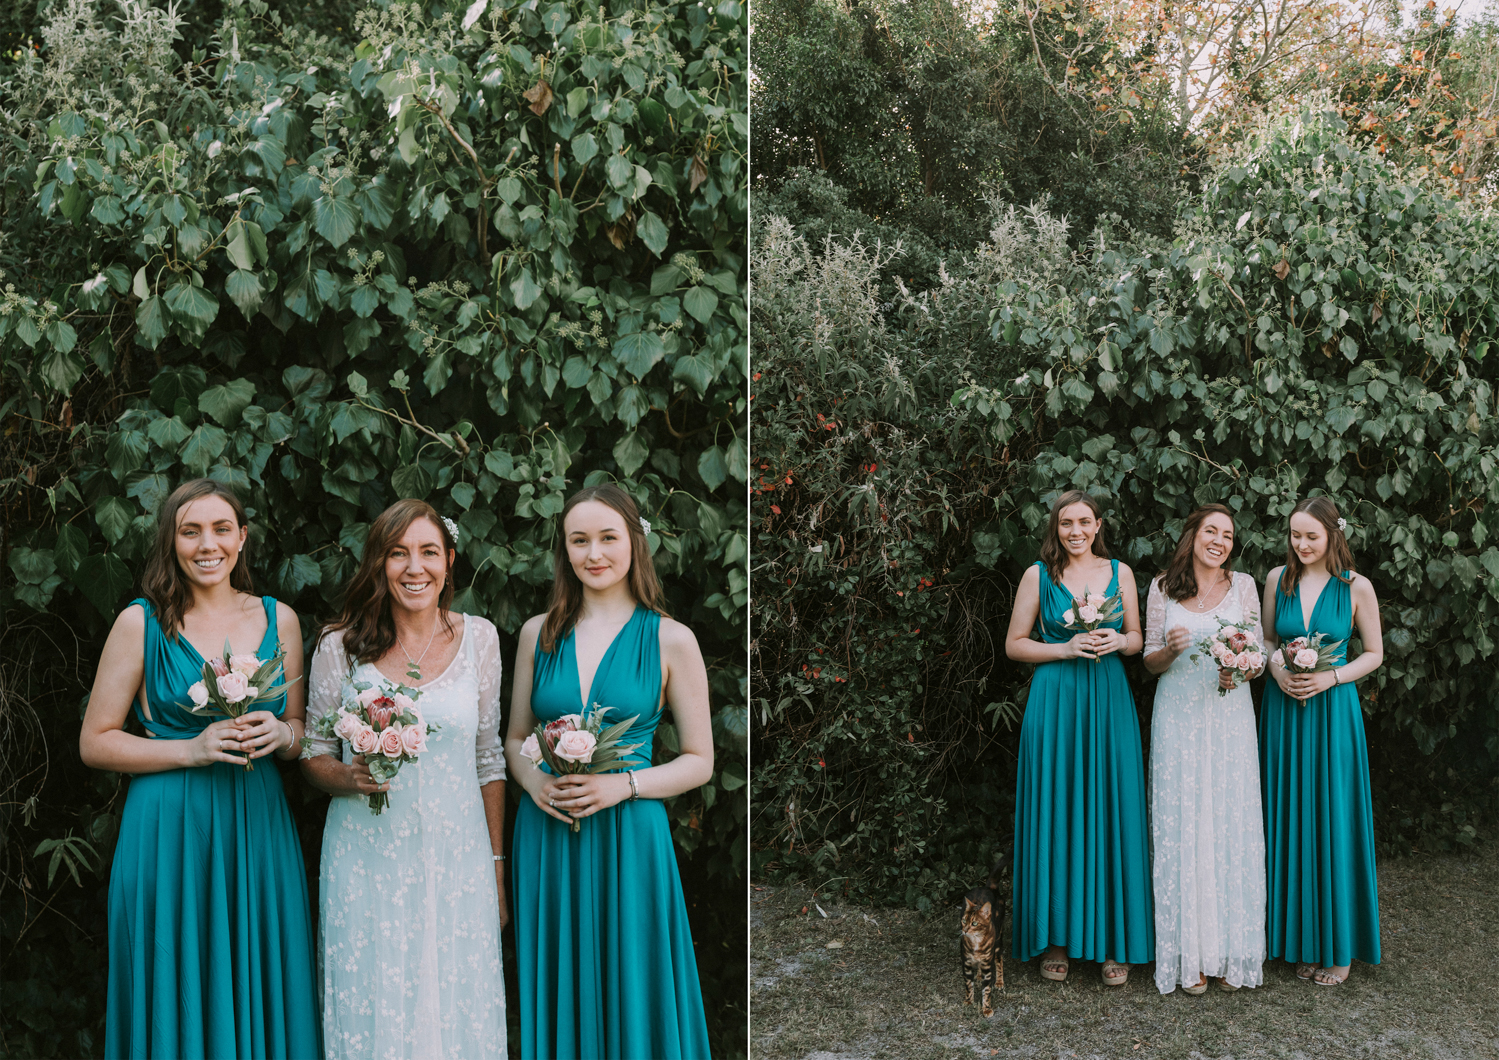 cape town wedding photographer - bianca asher-8.jpg